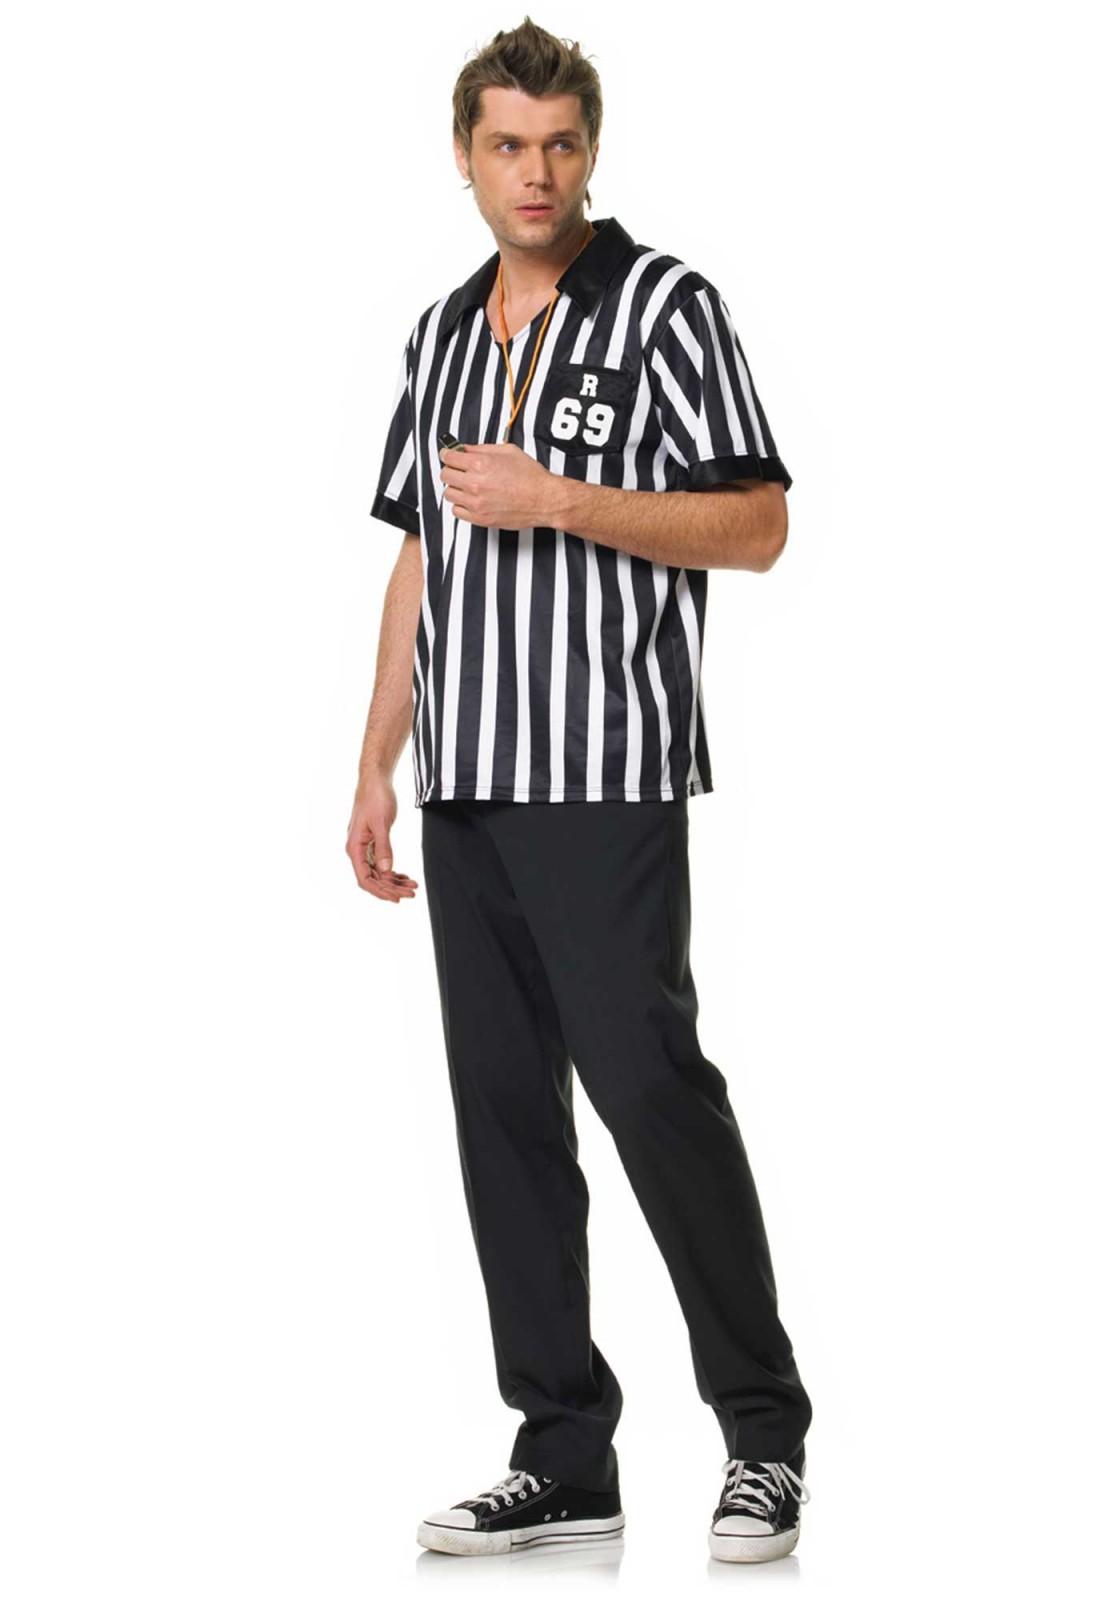 Men's Referee Shirts